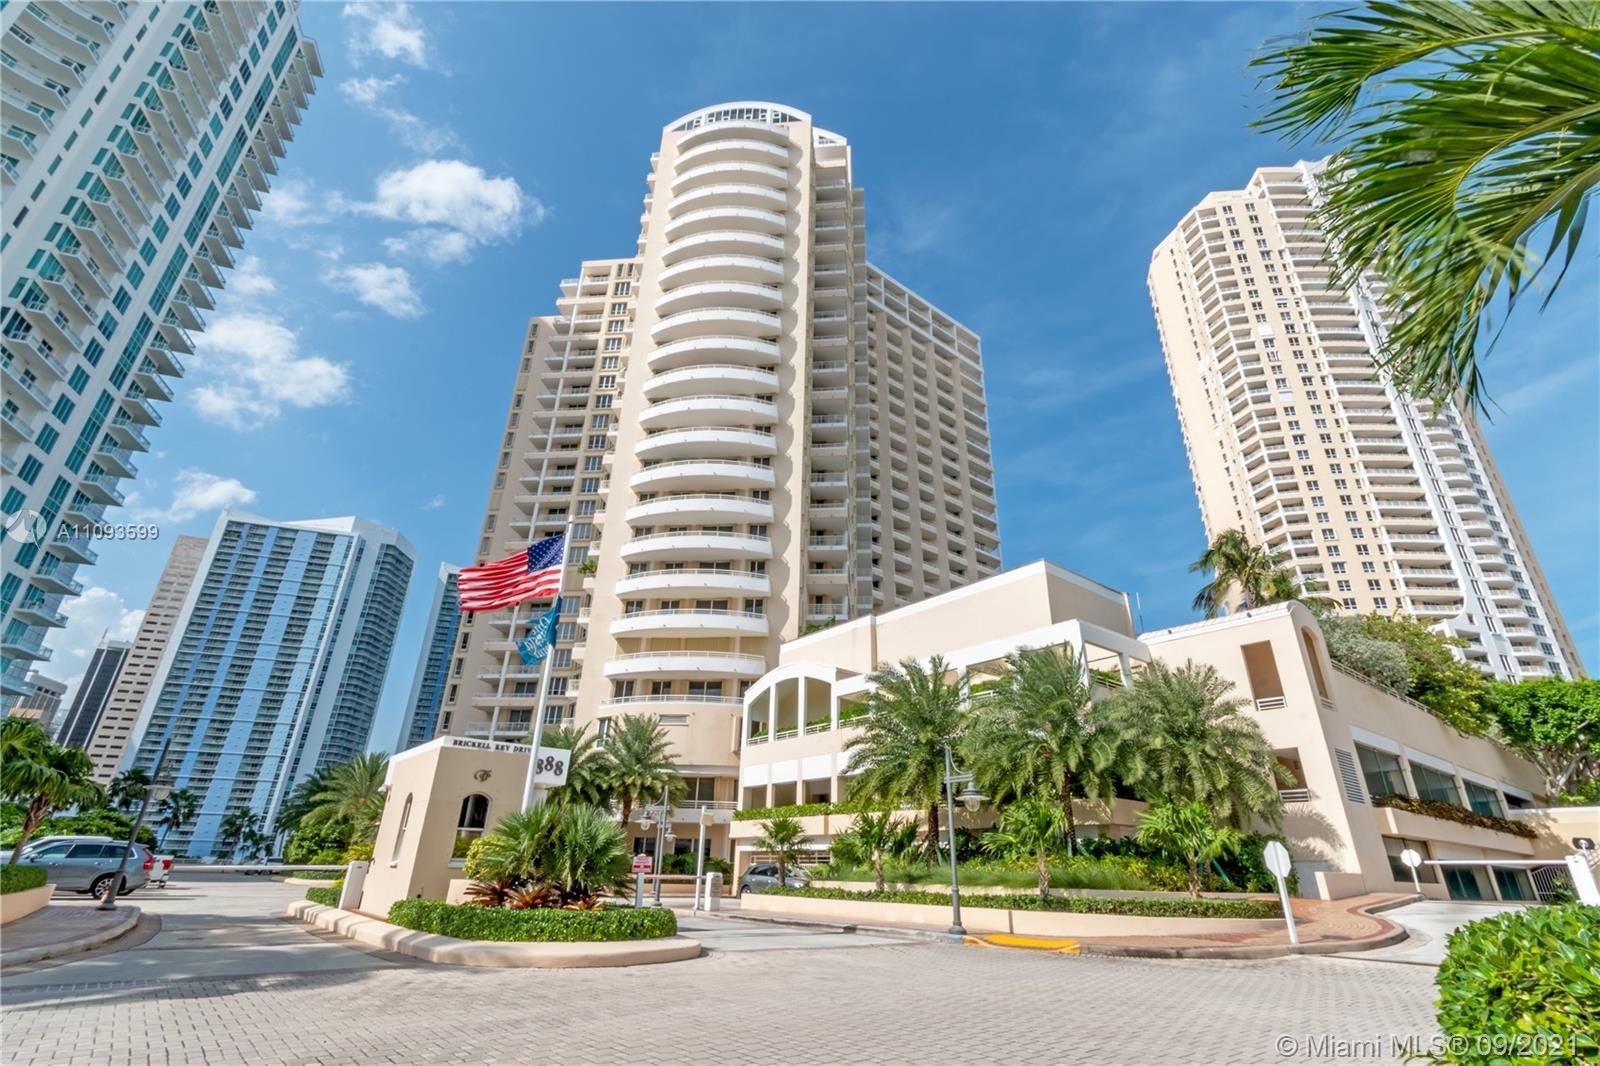 888 Brickell Key Dr #1207, Miami, FL 33131 - #: A11093599